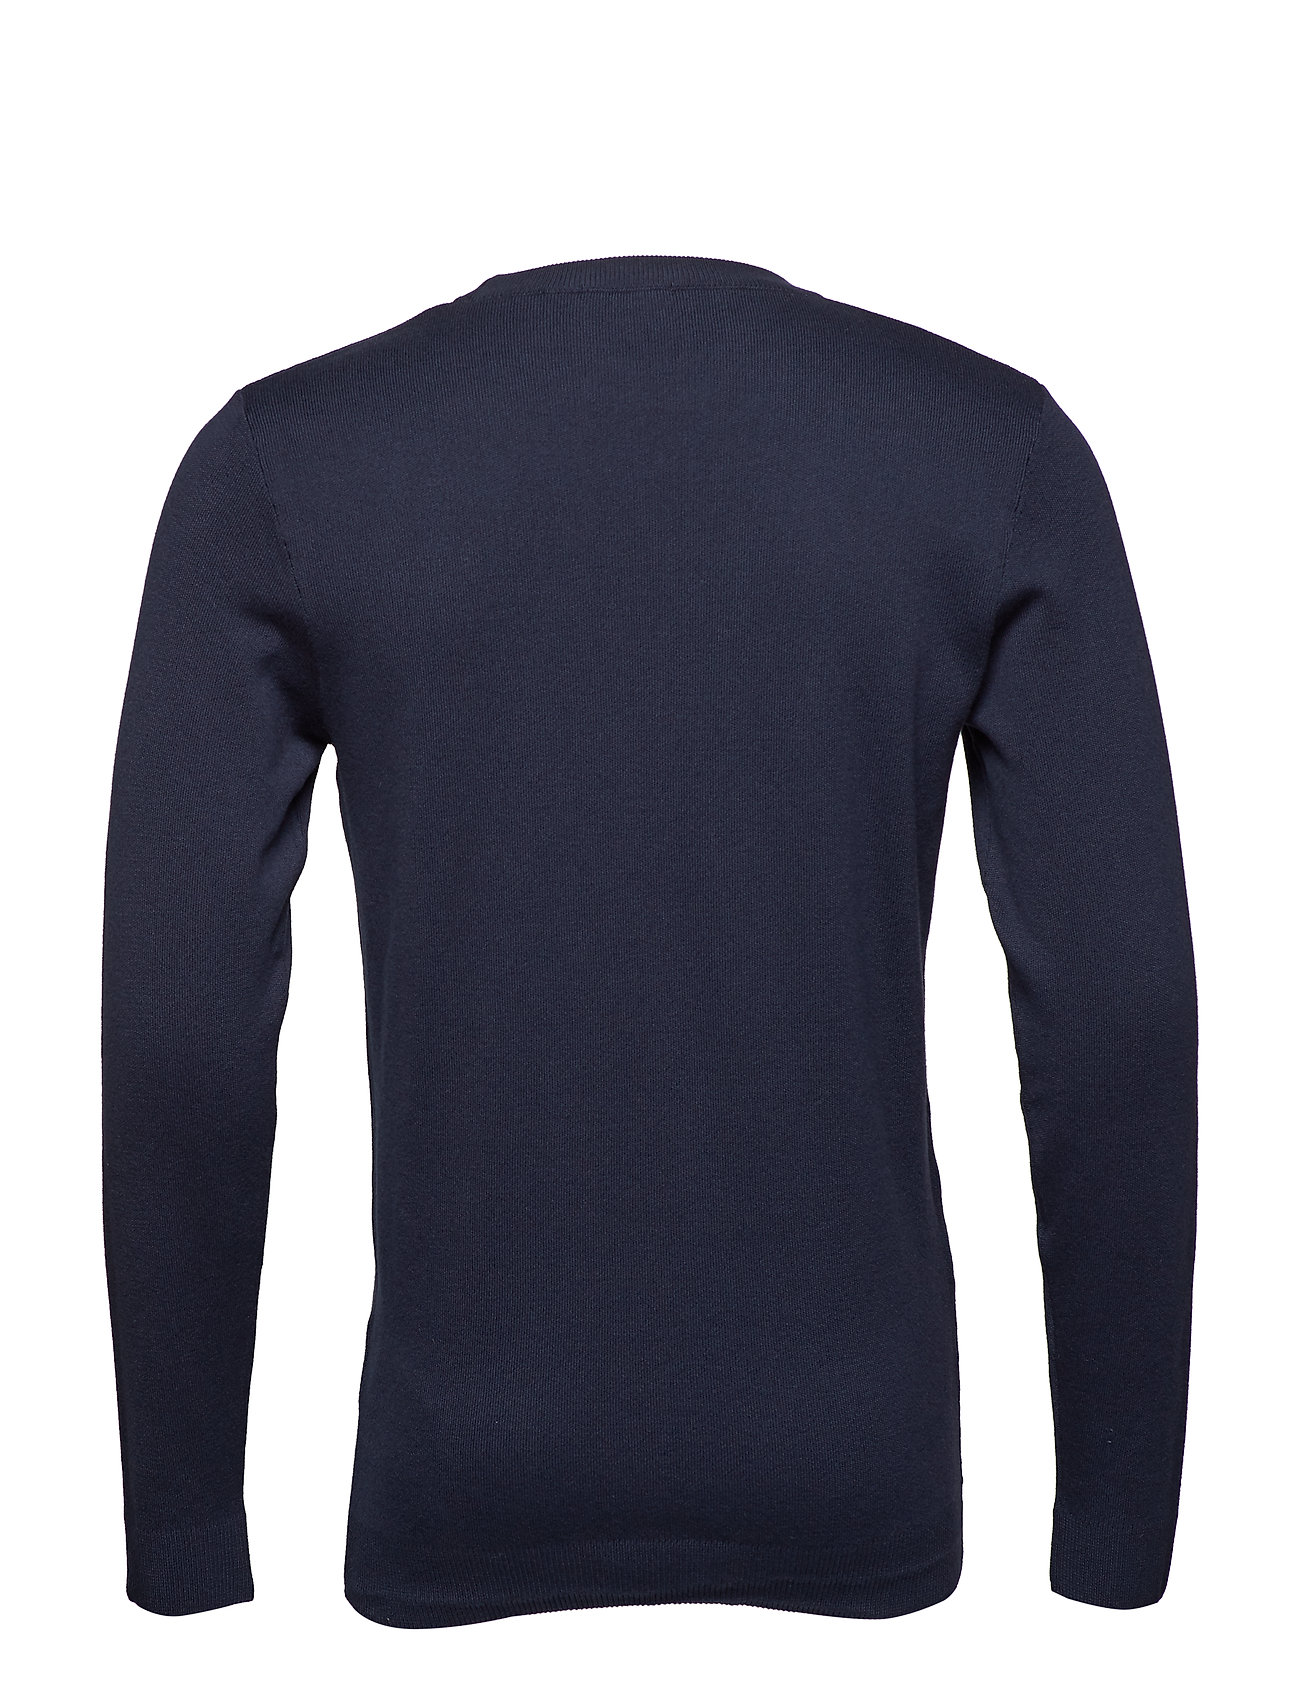 Plain Knit EclipseKnowledge Cotton With Apparel TextGotstotal TJl5F3K1uc